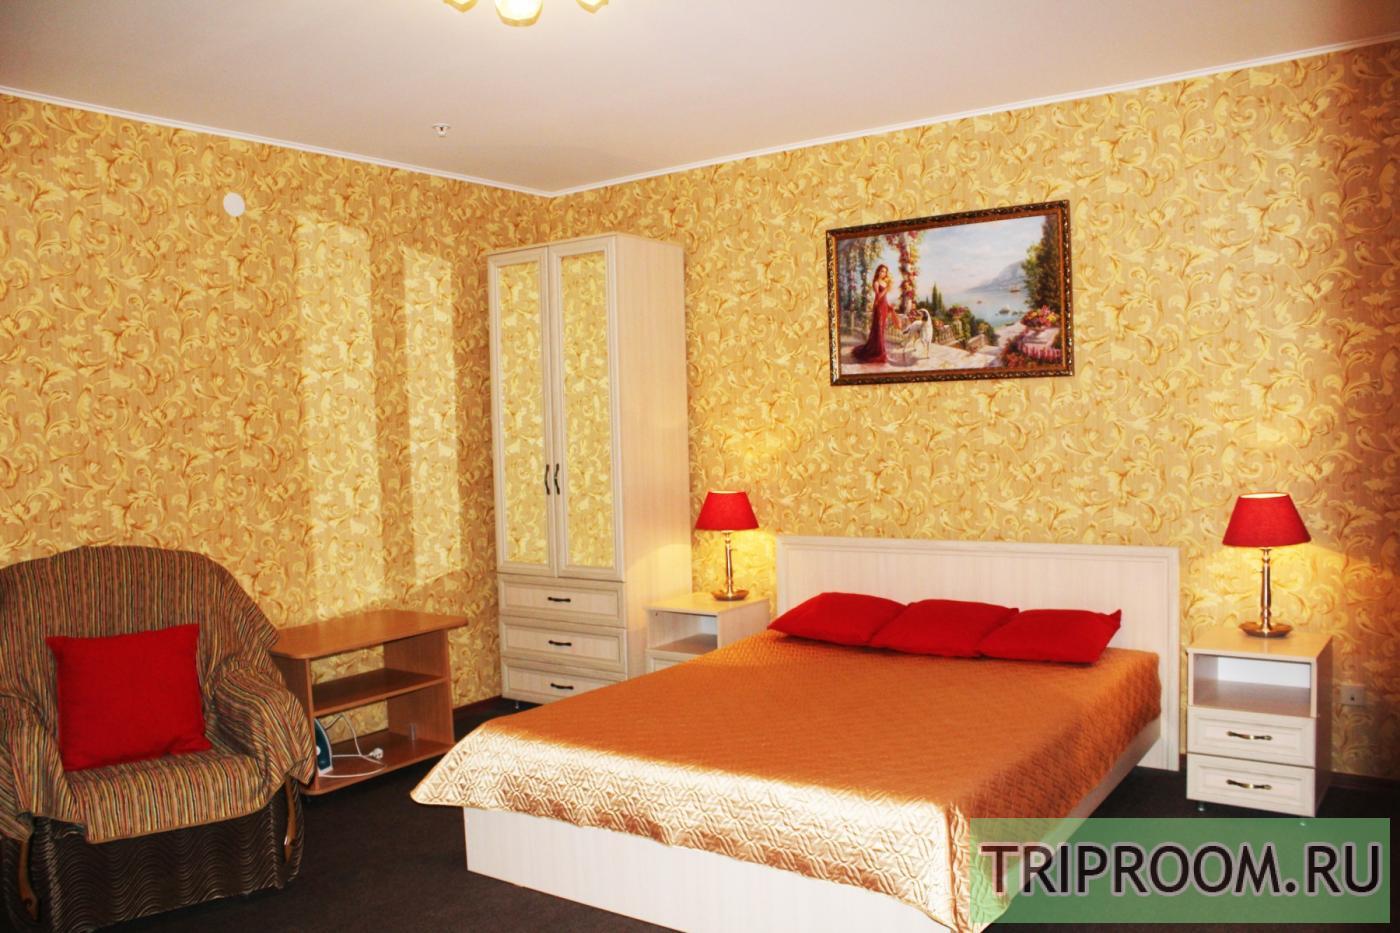 1-комнатная квартира посуточно (вариант № 35144), ул. Гагарина бульвар, фото № 2